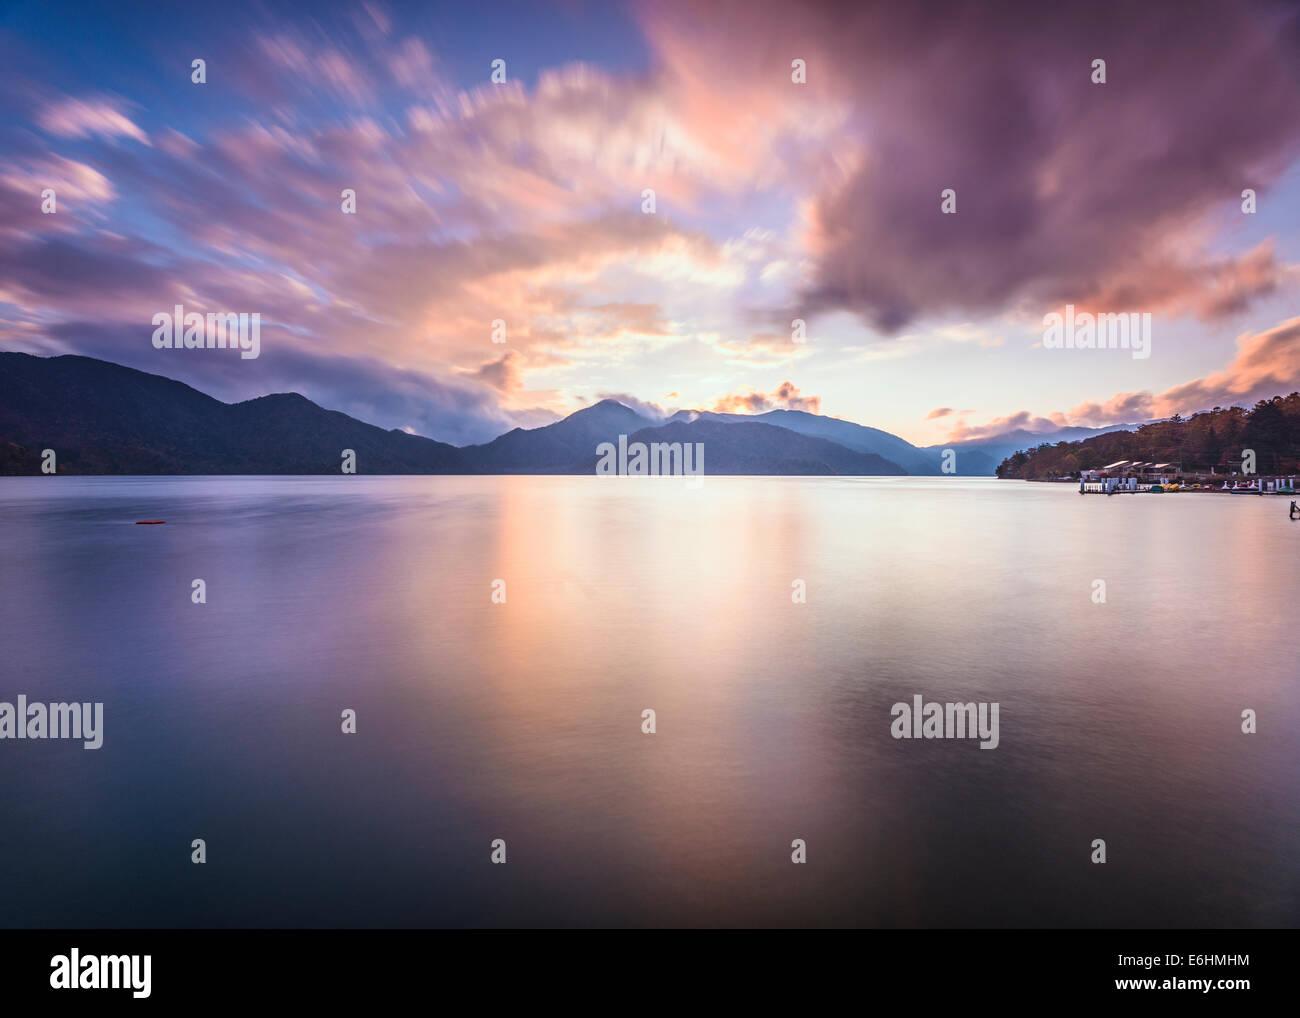 El lago Chuzenji en Nikko, Japón. Imagen De Stock